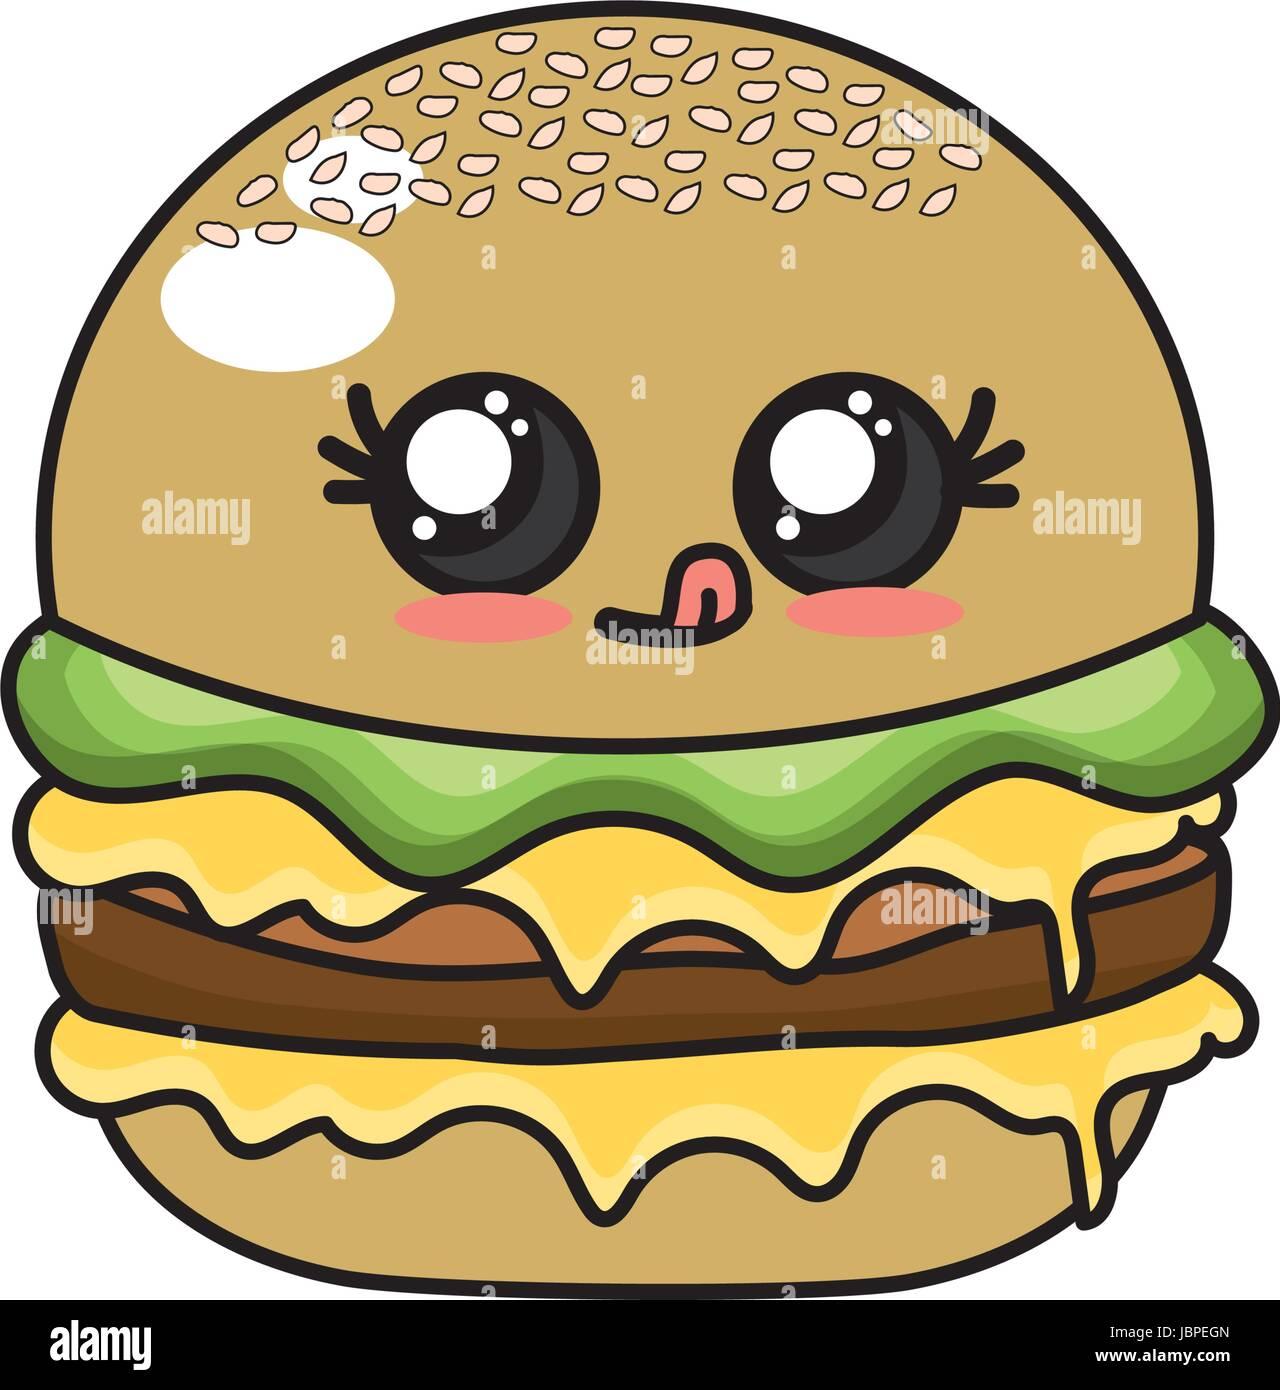 Kawaii Cute Hamburger Fast Food